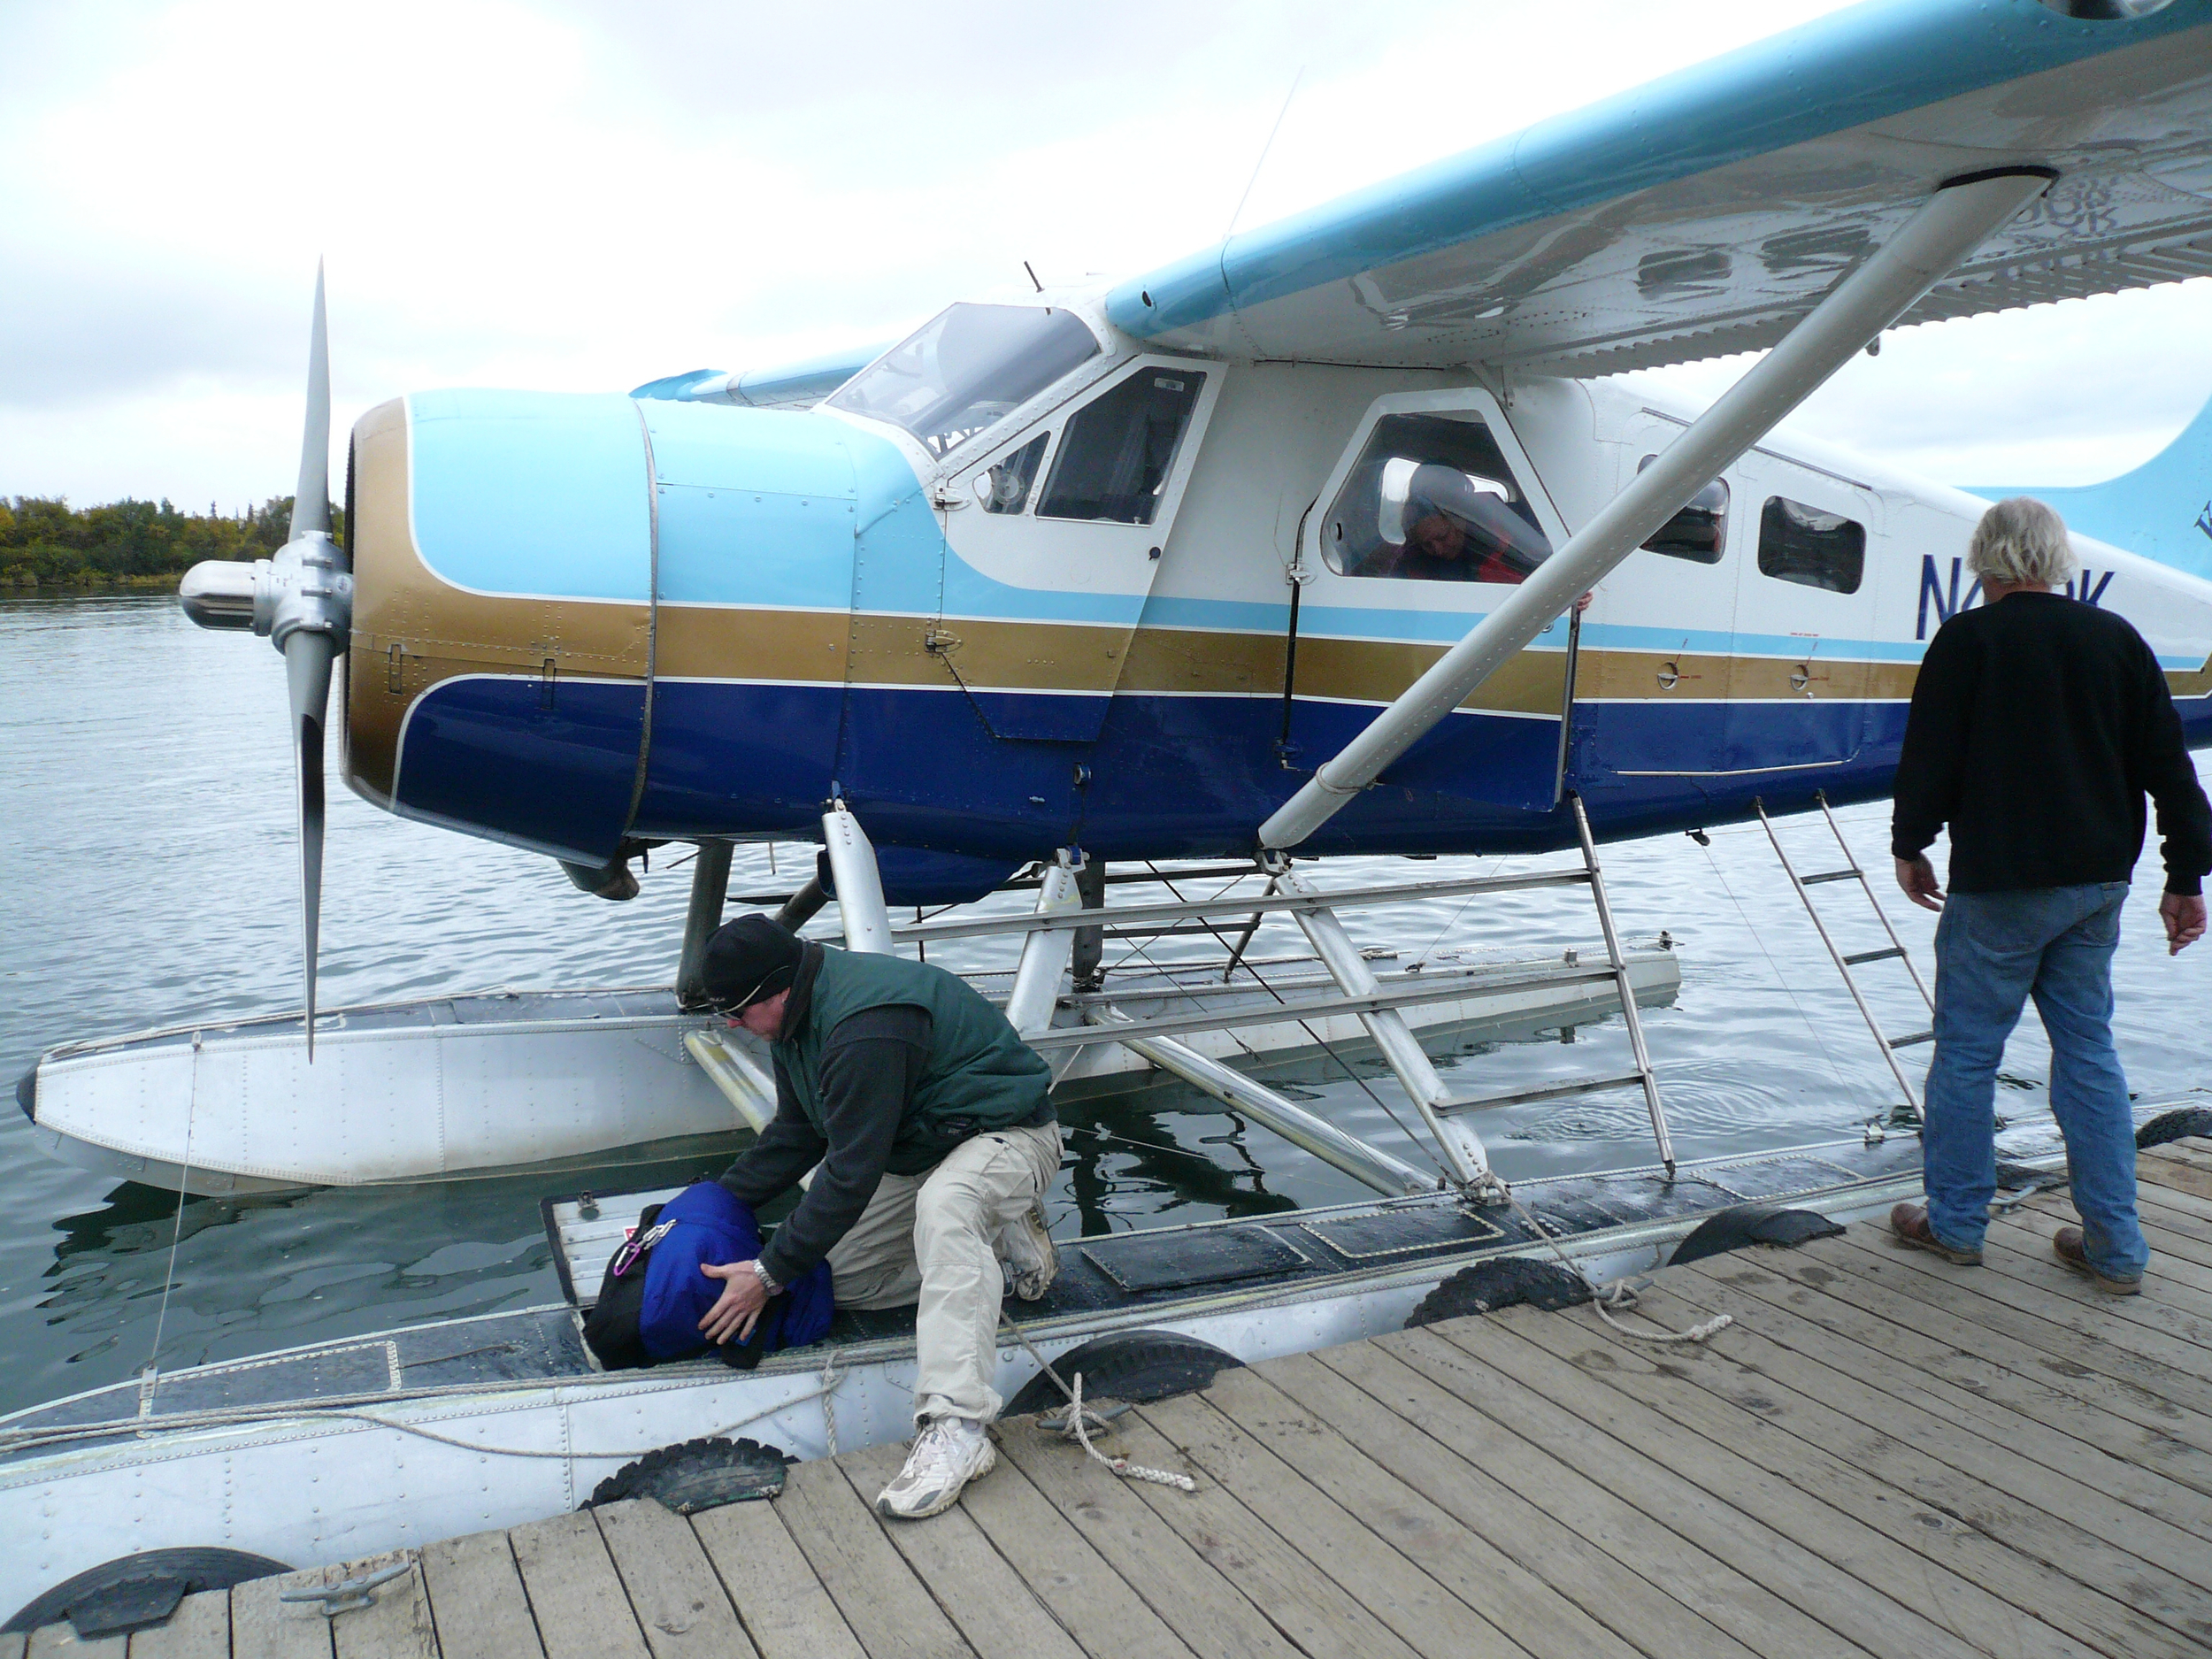 Gear storage for flight